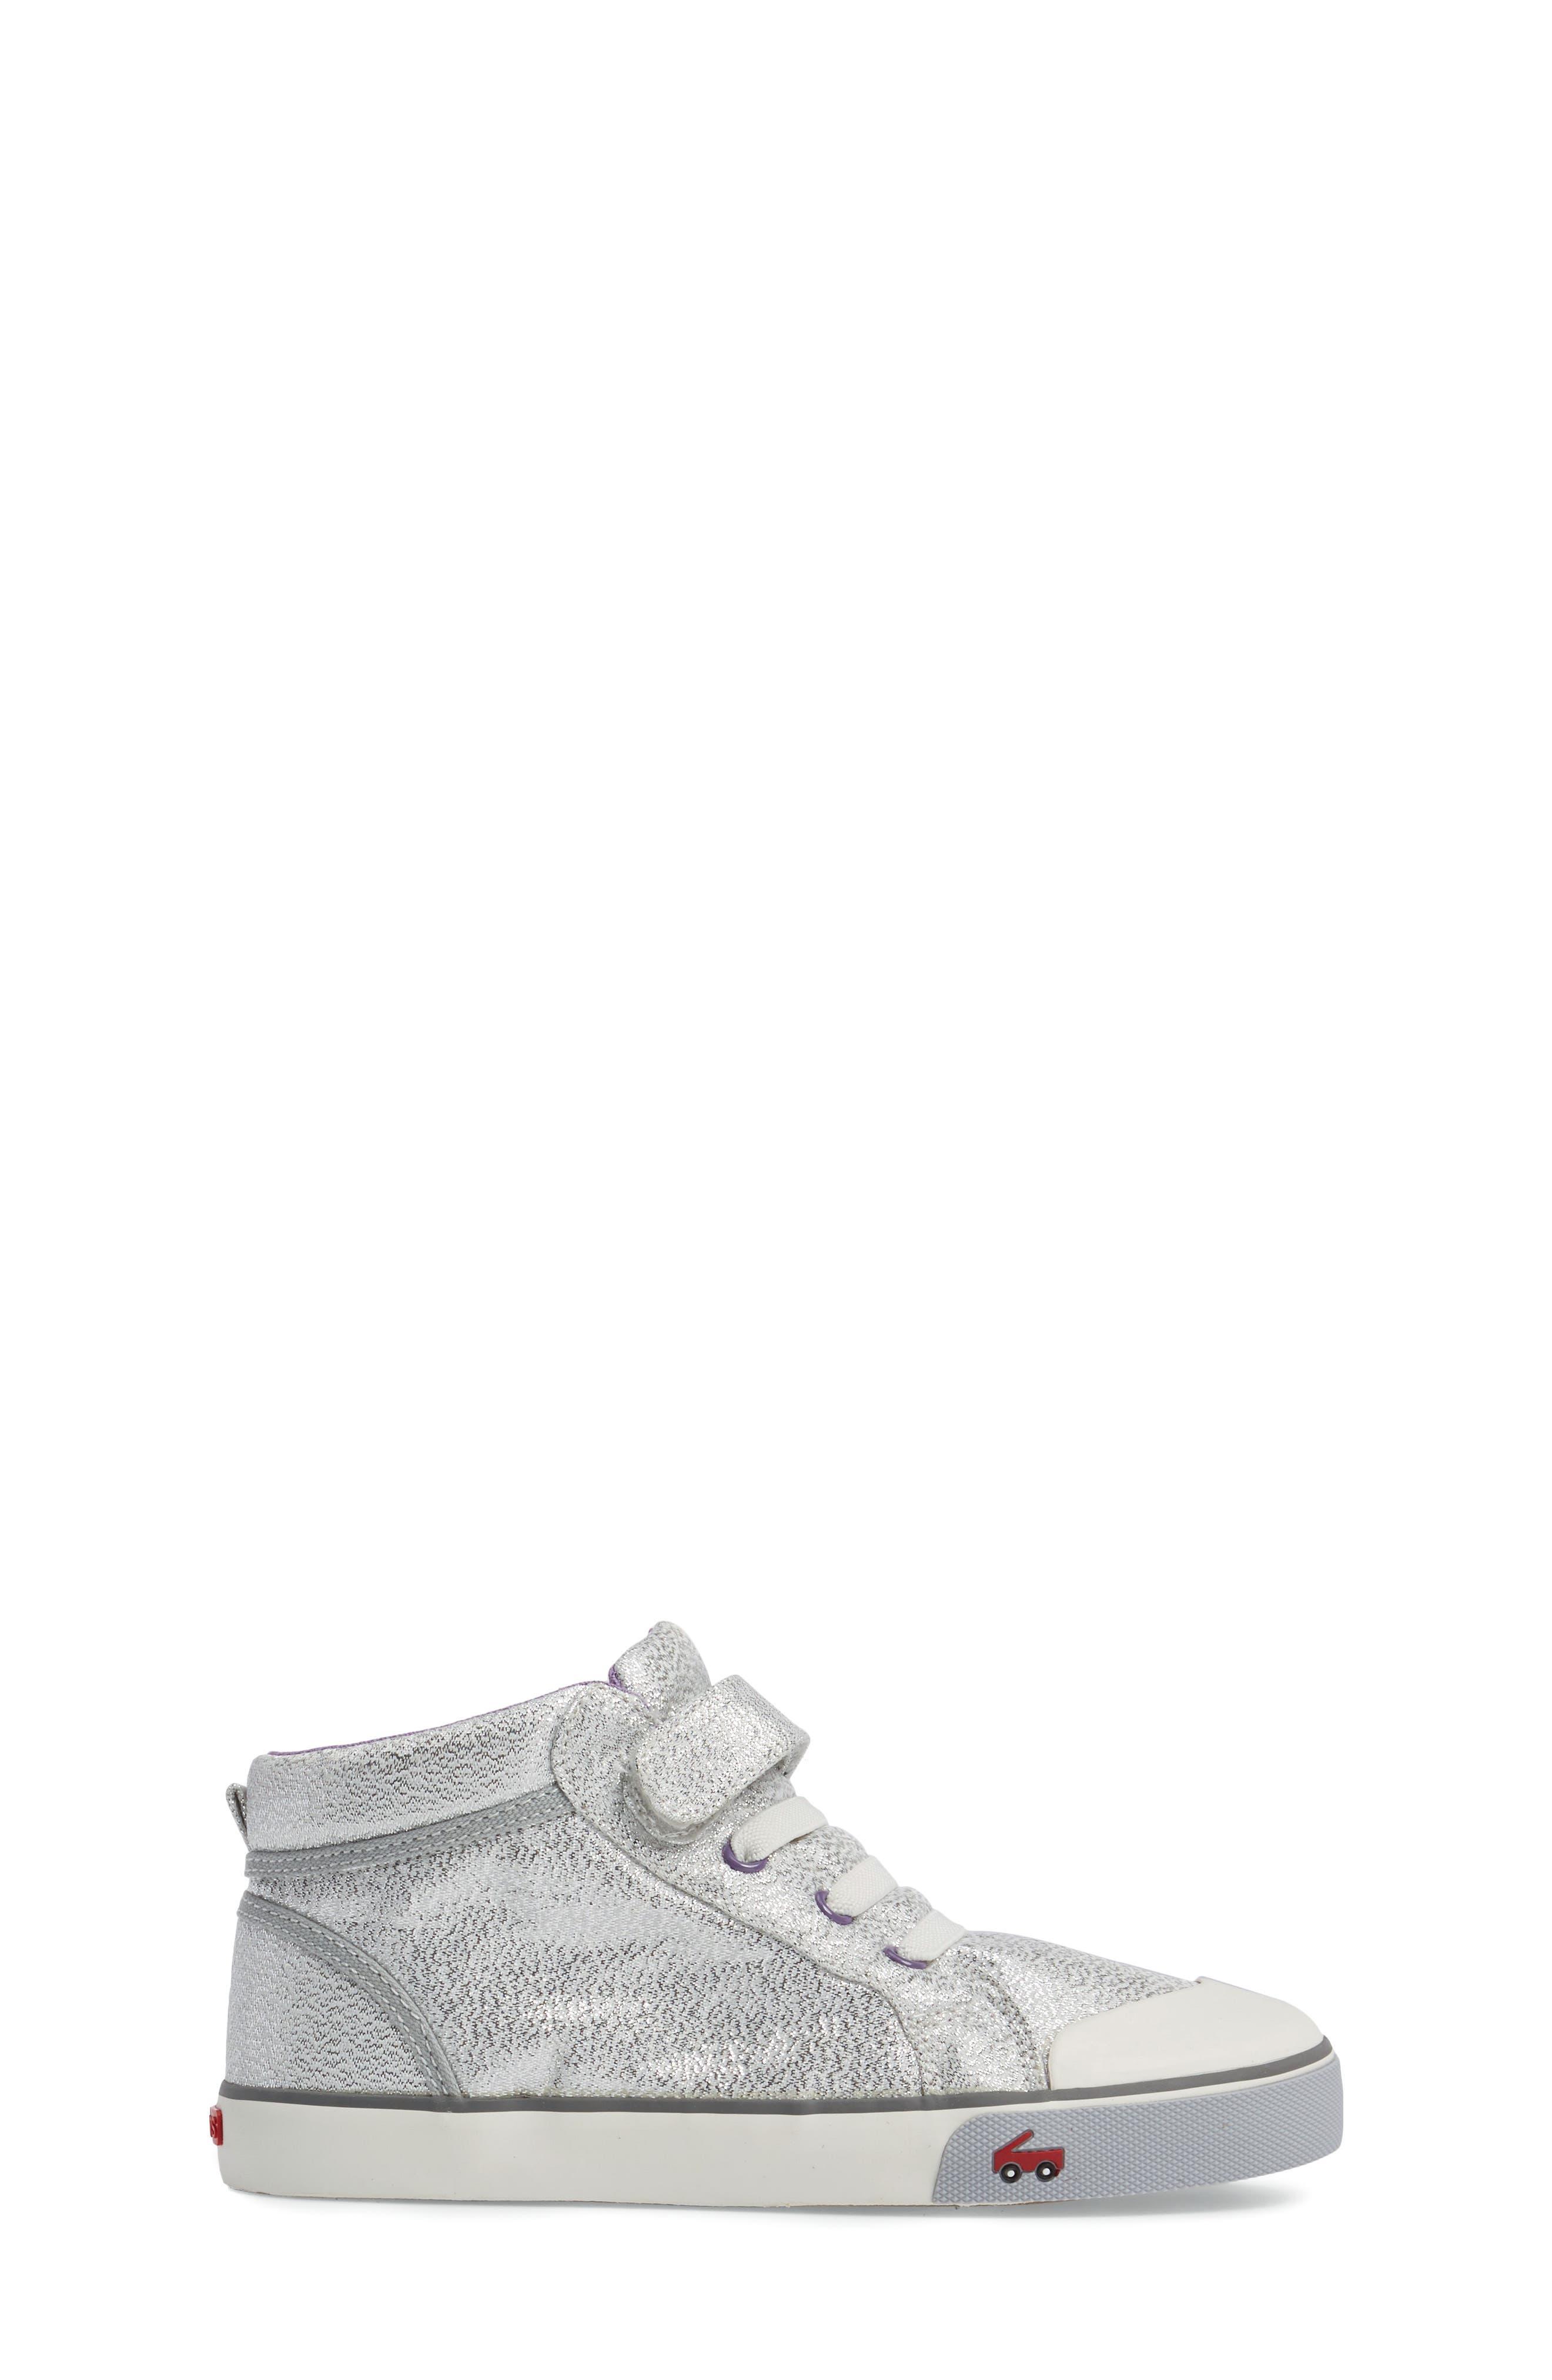 Peyton Metallic Mid Top Sneaker,                             Alternate thumbnail 3, color,                             Silver